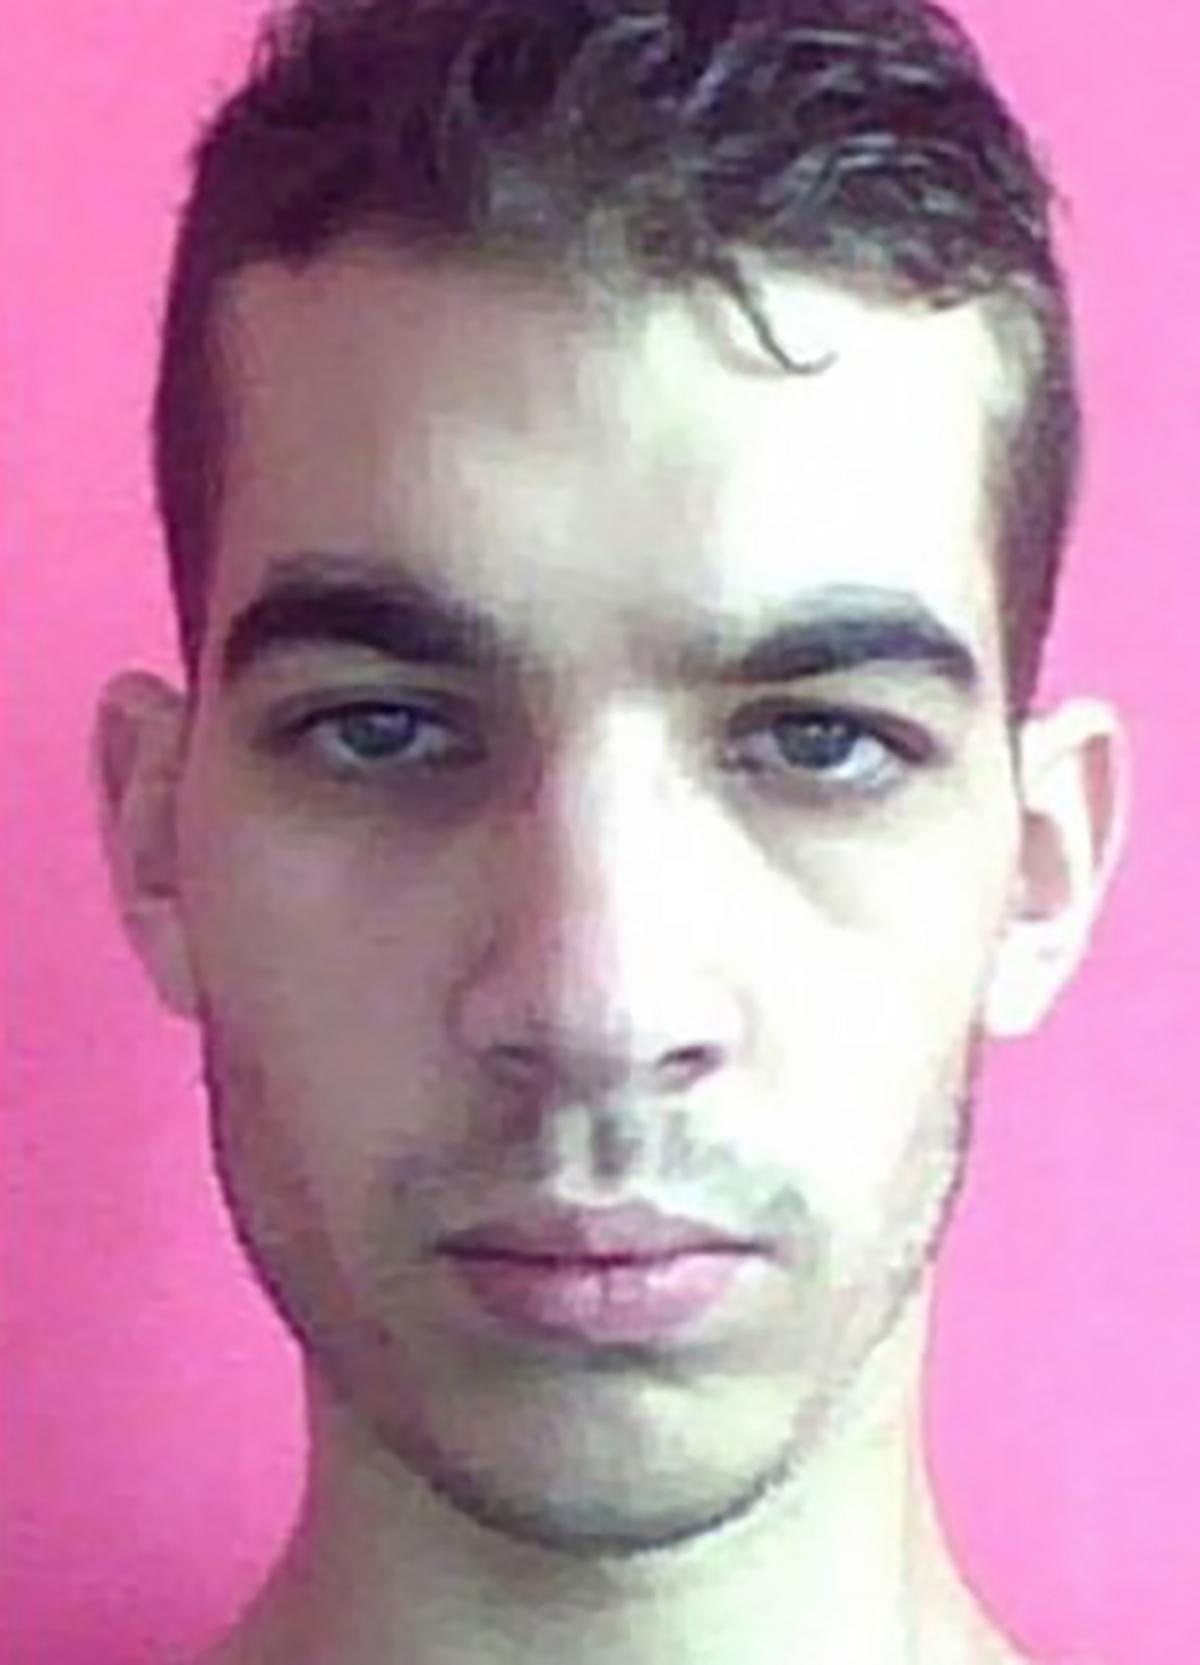 Omar Ismail Mostefai